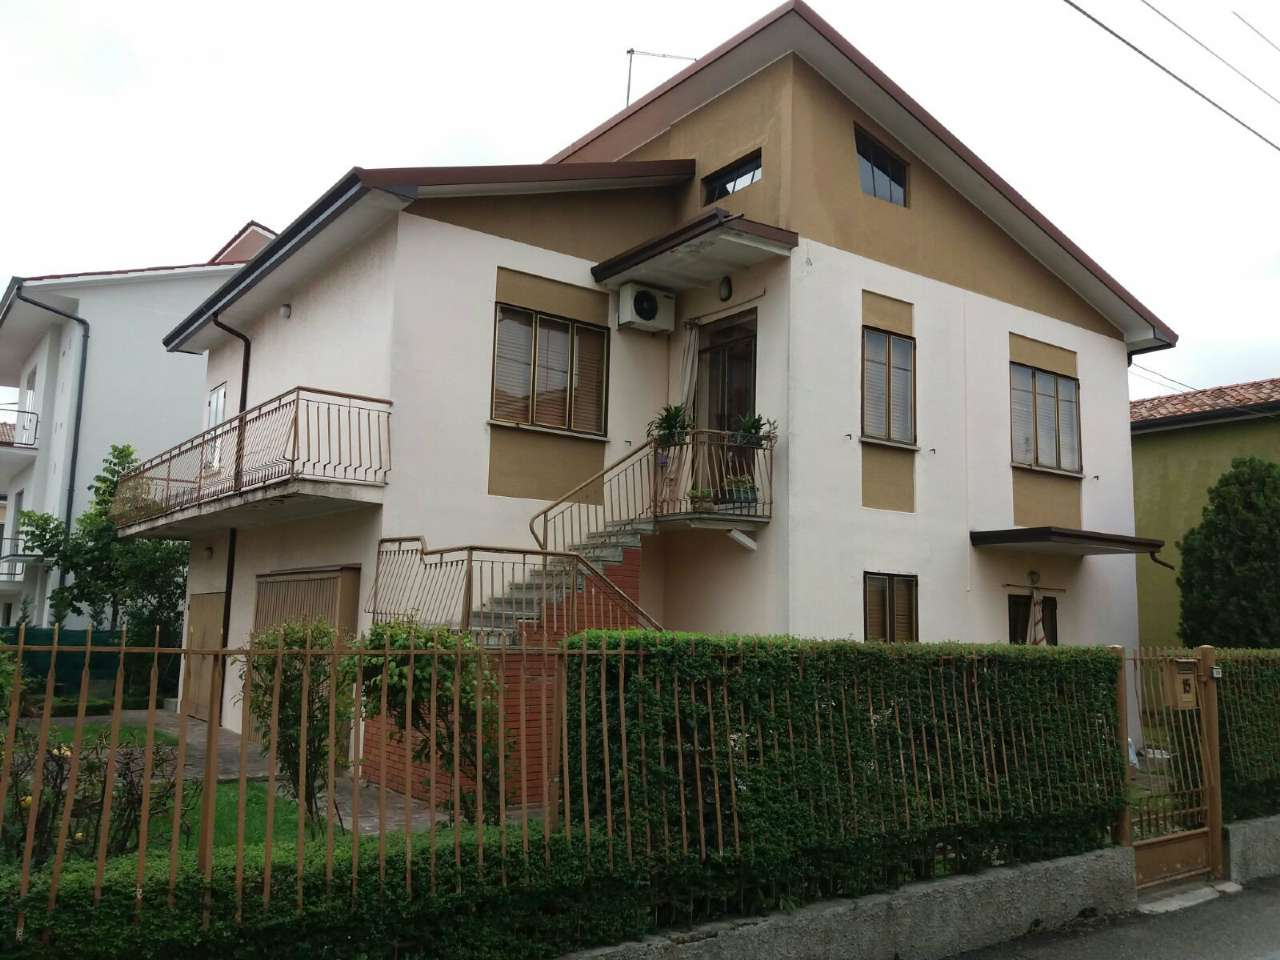 padova vendita quart: bassanello agenzia immobiliare san leonardo